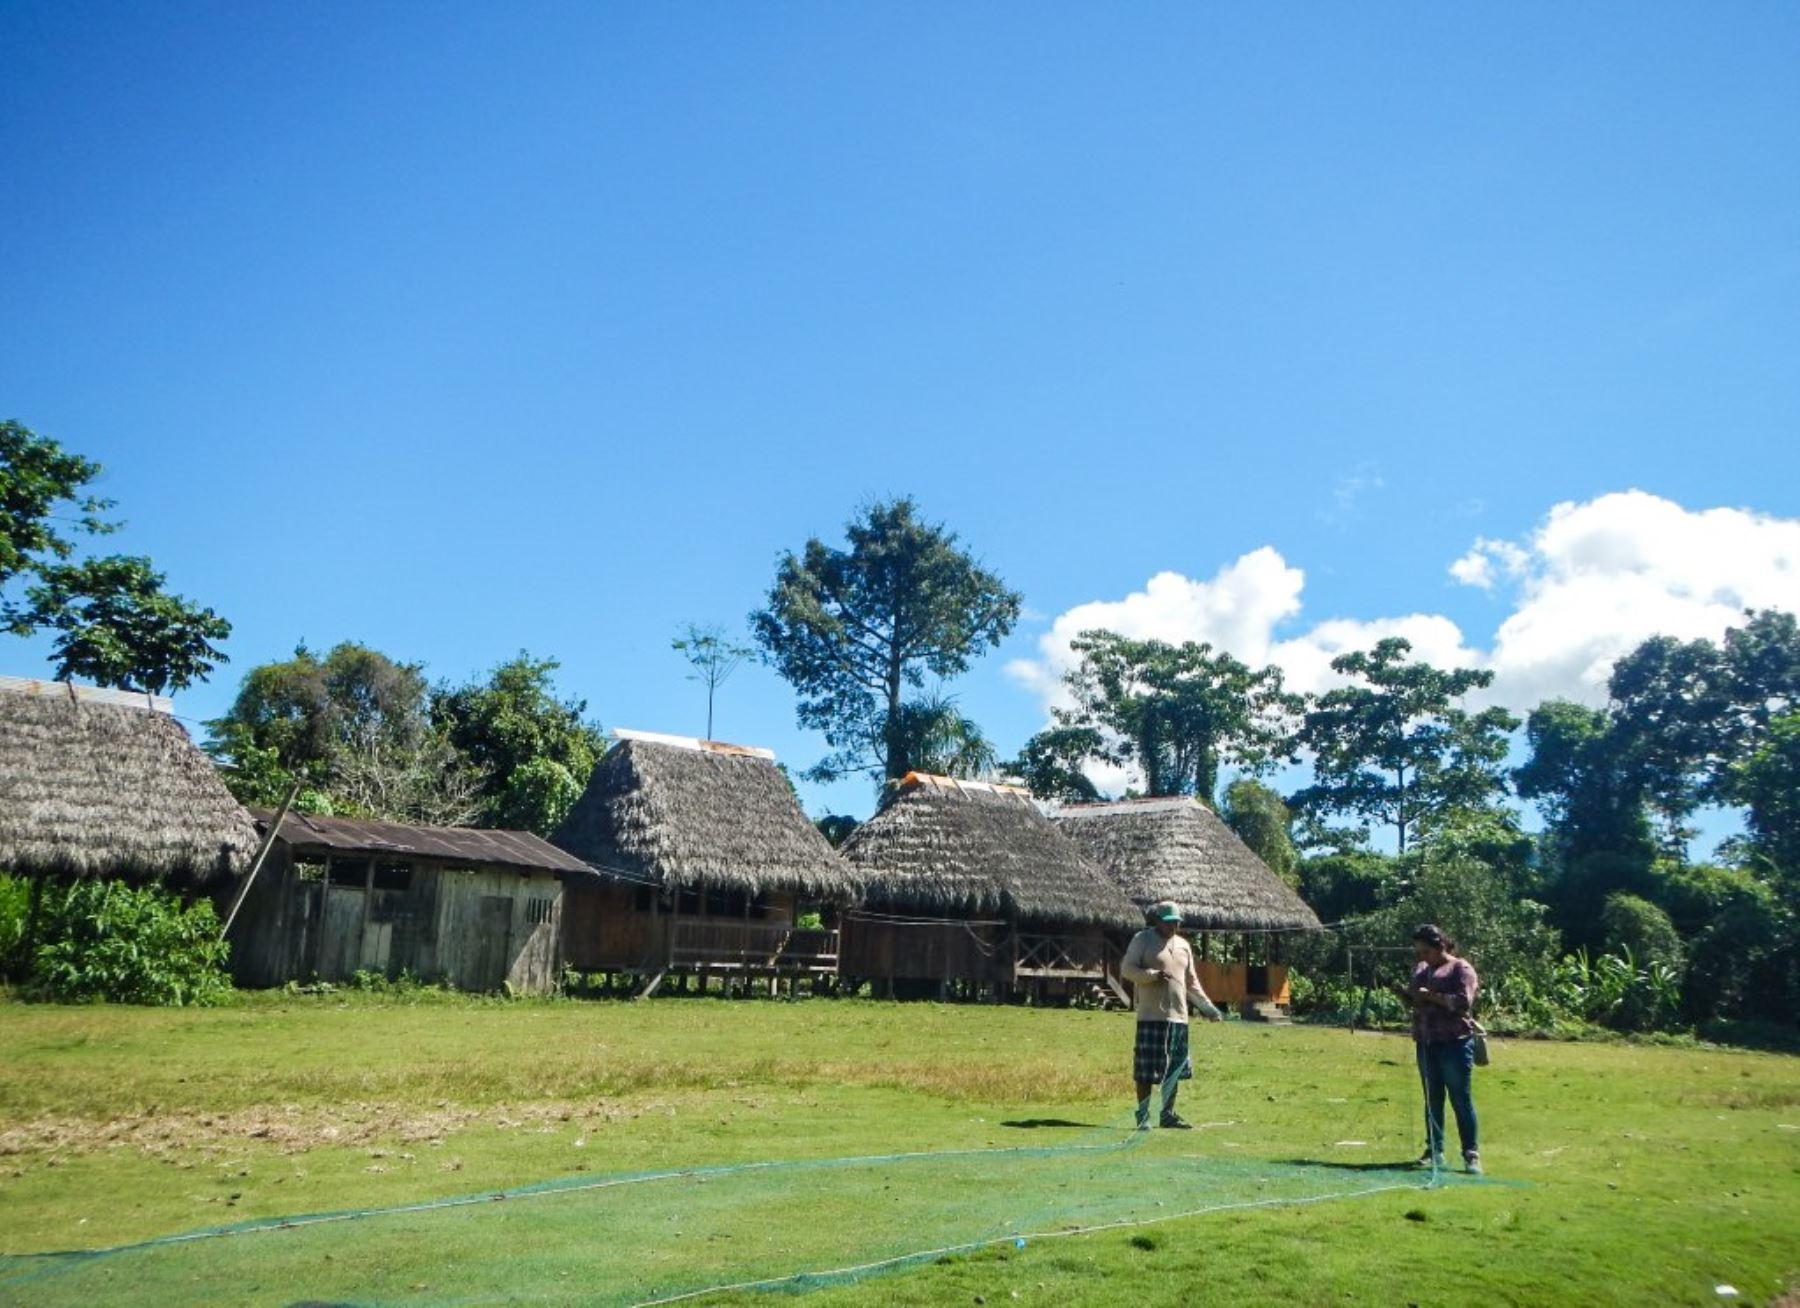 Comunidades indígenas impulsan turismo para conservar bosques.